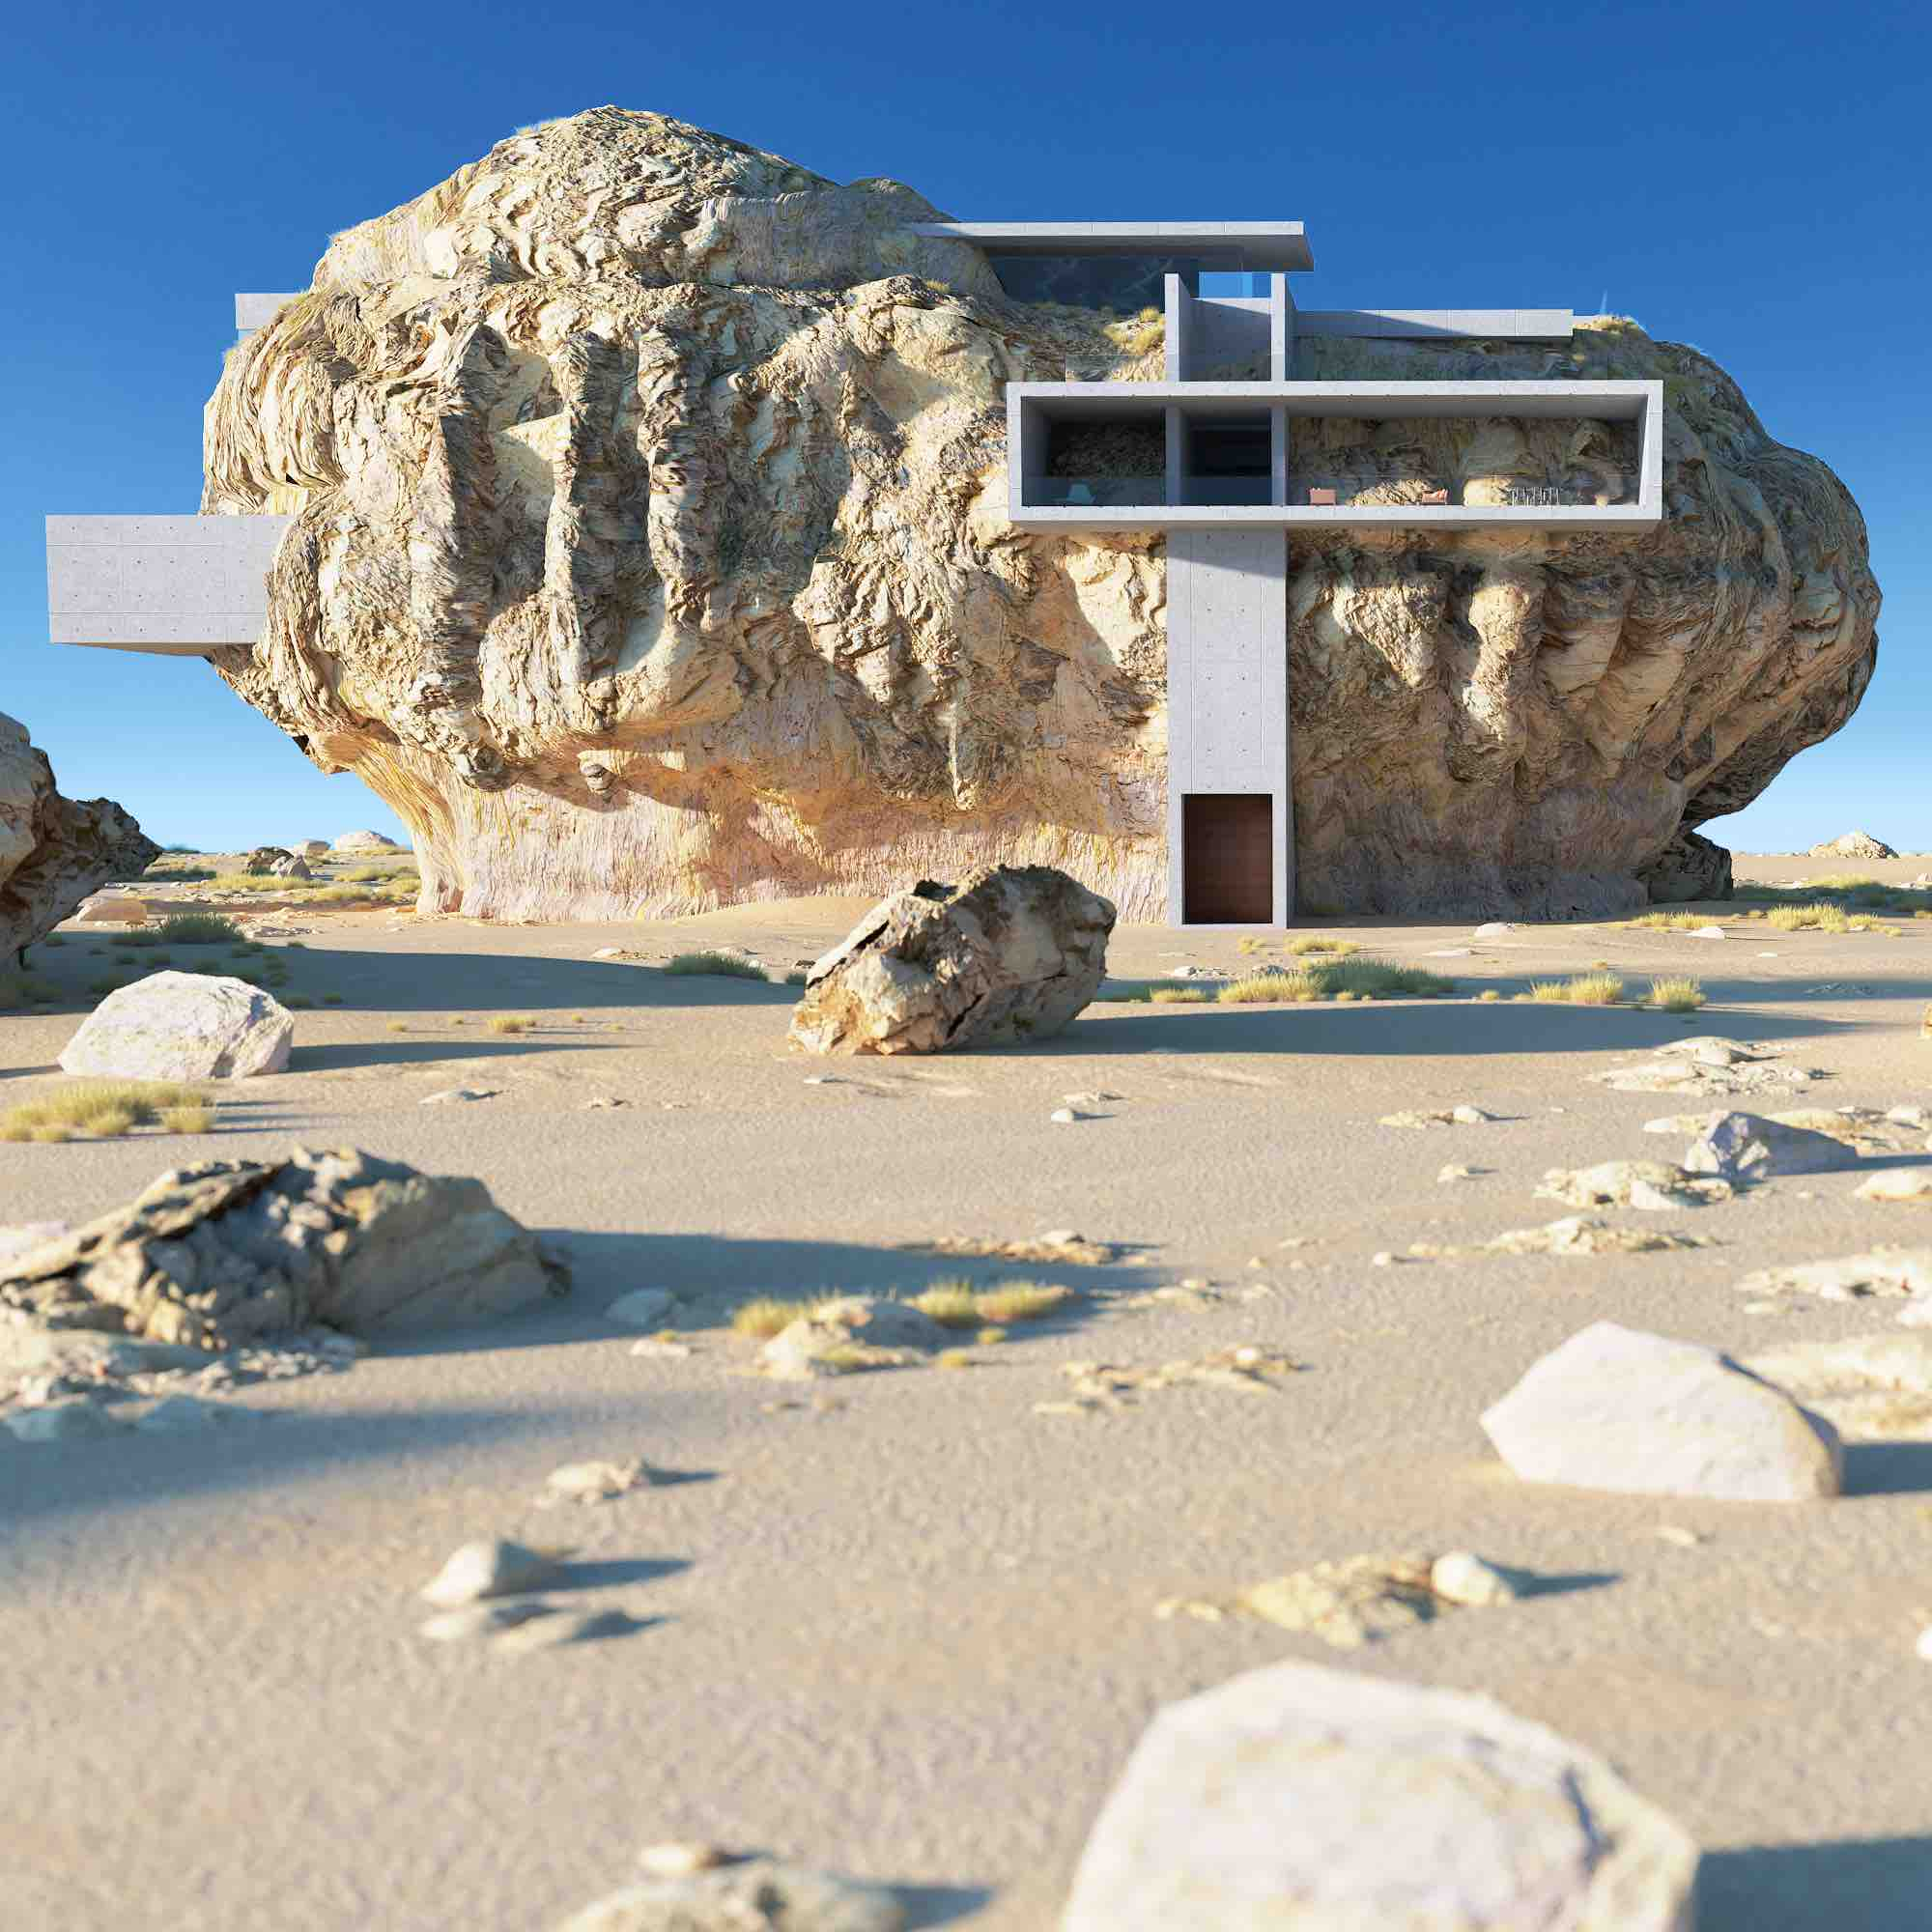 House-inside-a-rock-Amey-Kandalgaonkar-SaudiArabia-003.jpg